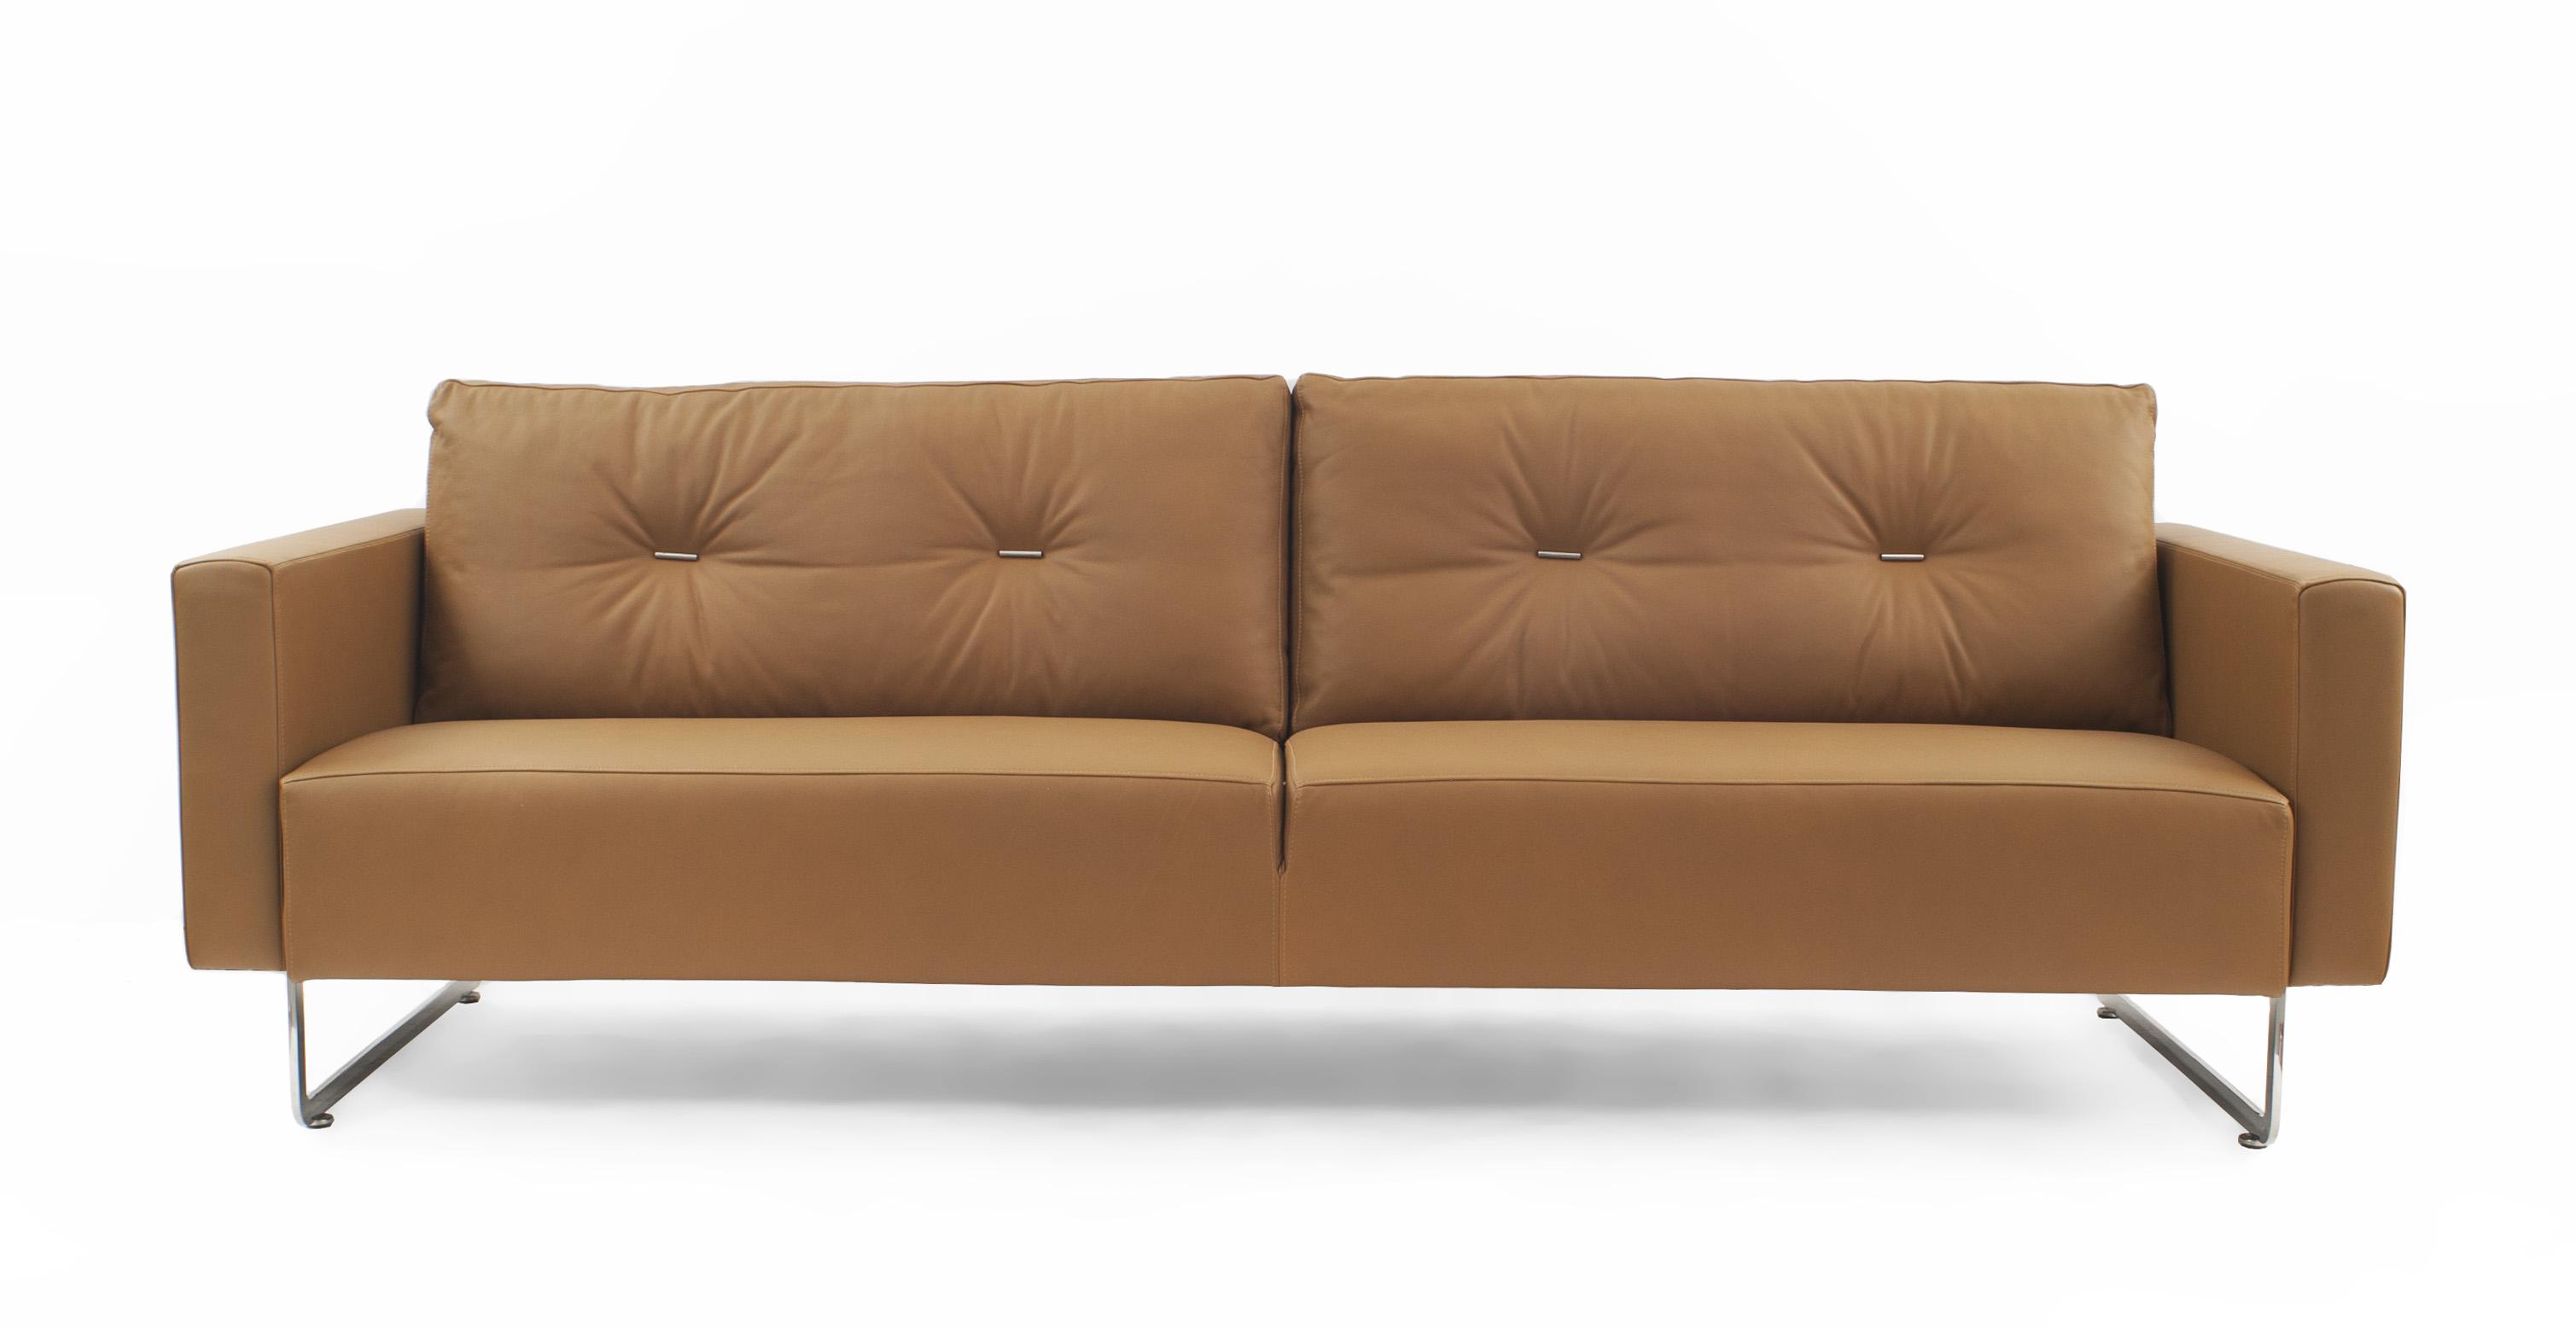 Contemporary caramel leather sofa | NEWEL